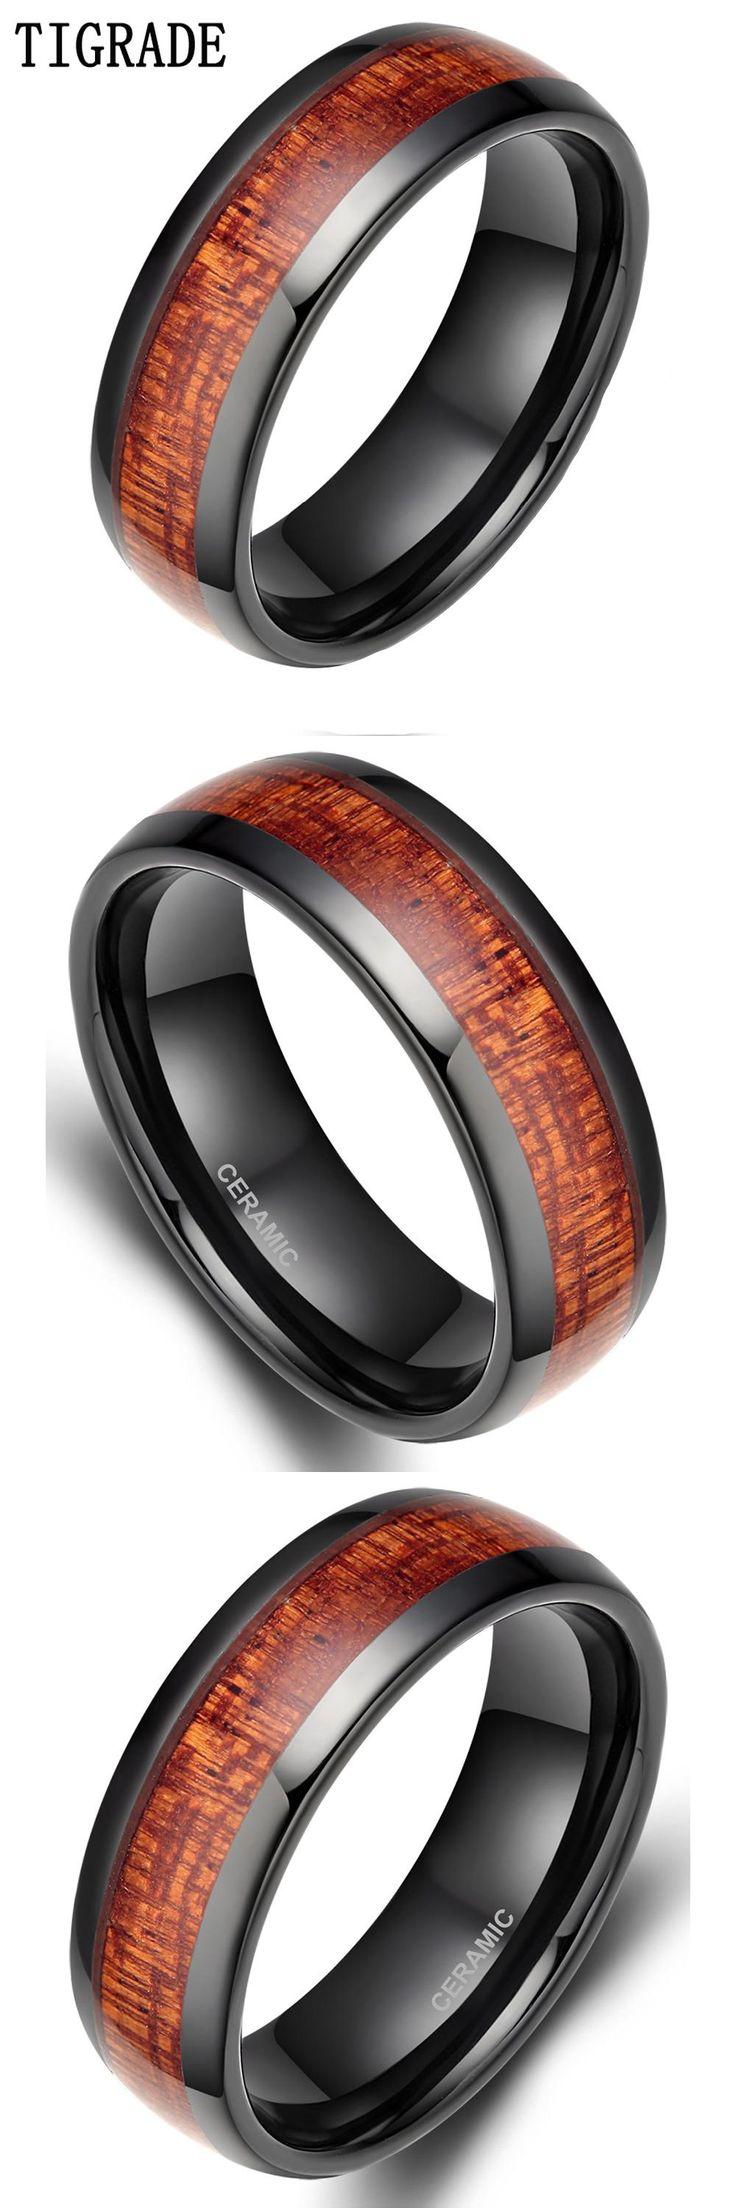 [visit To Buy] Tigrade 8mm Black Red Wood Grain Ceramic Ring Men Wedding  Band